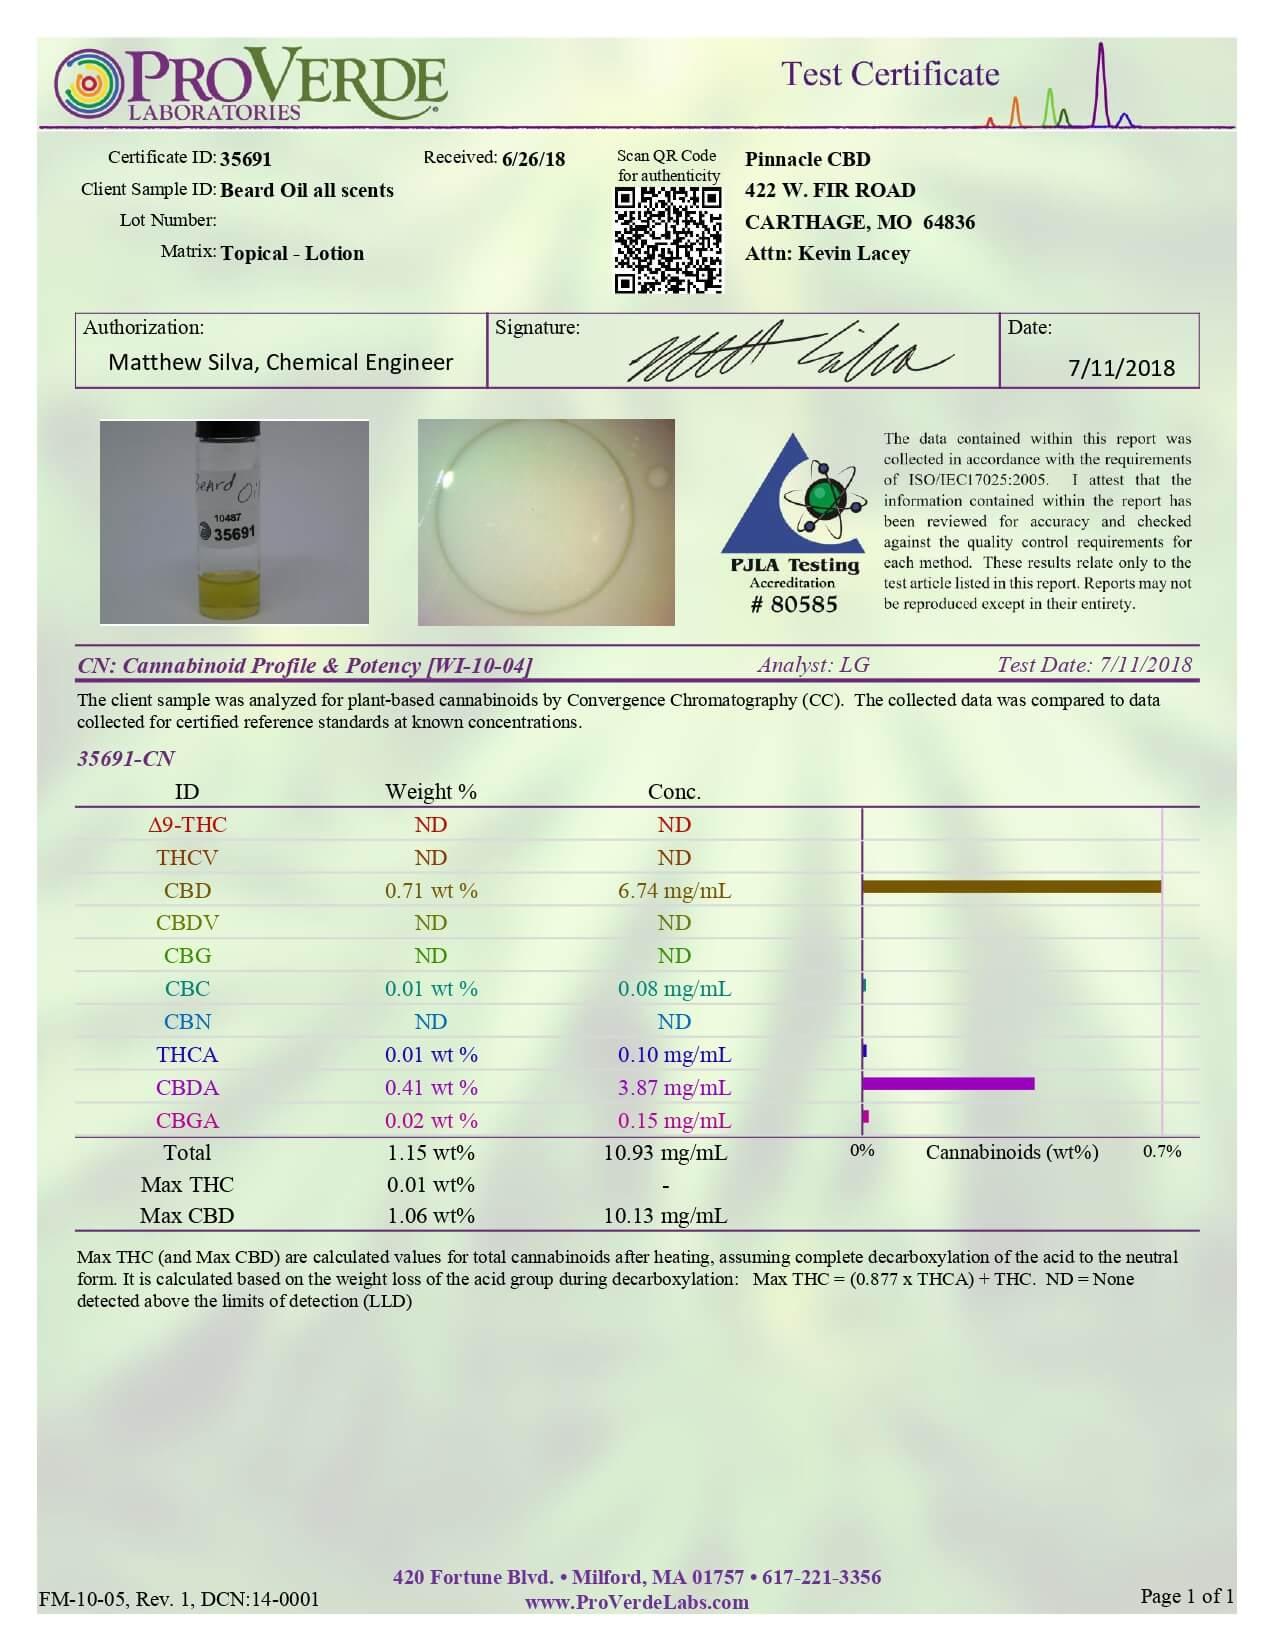 Pinnacle Hemp CBD Bath Sex Panther Full Spectrum Beard Oil Lab Report